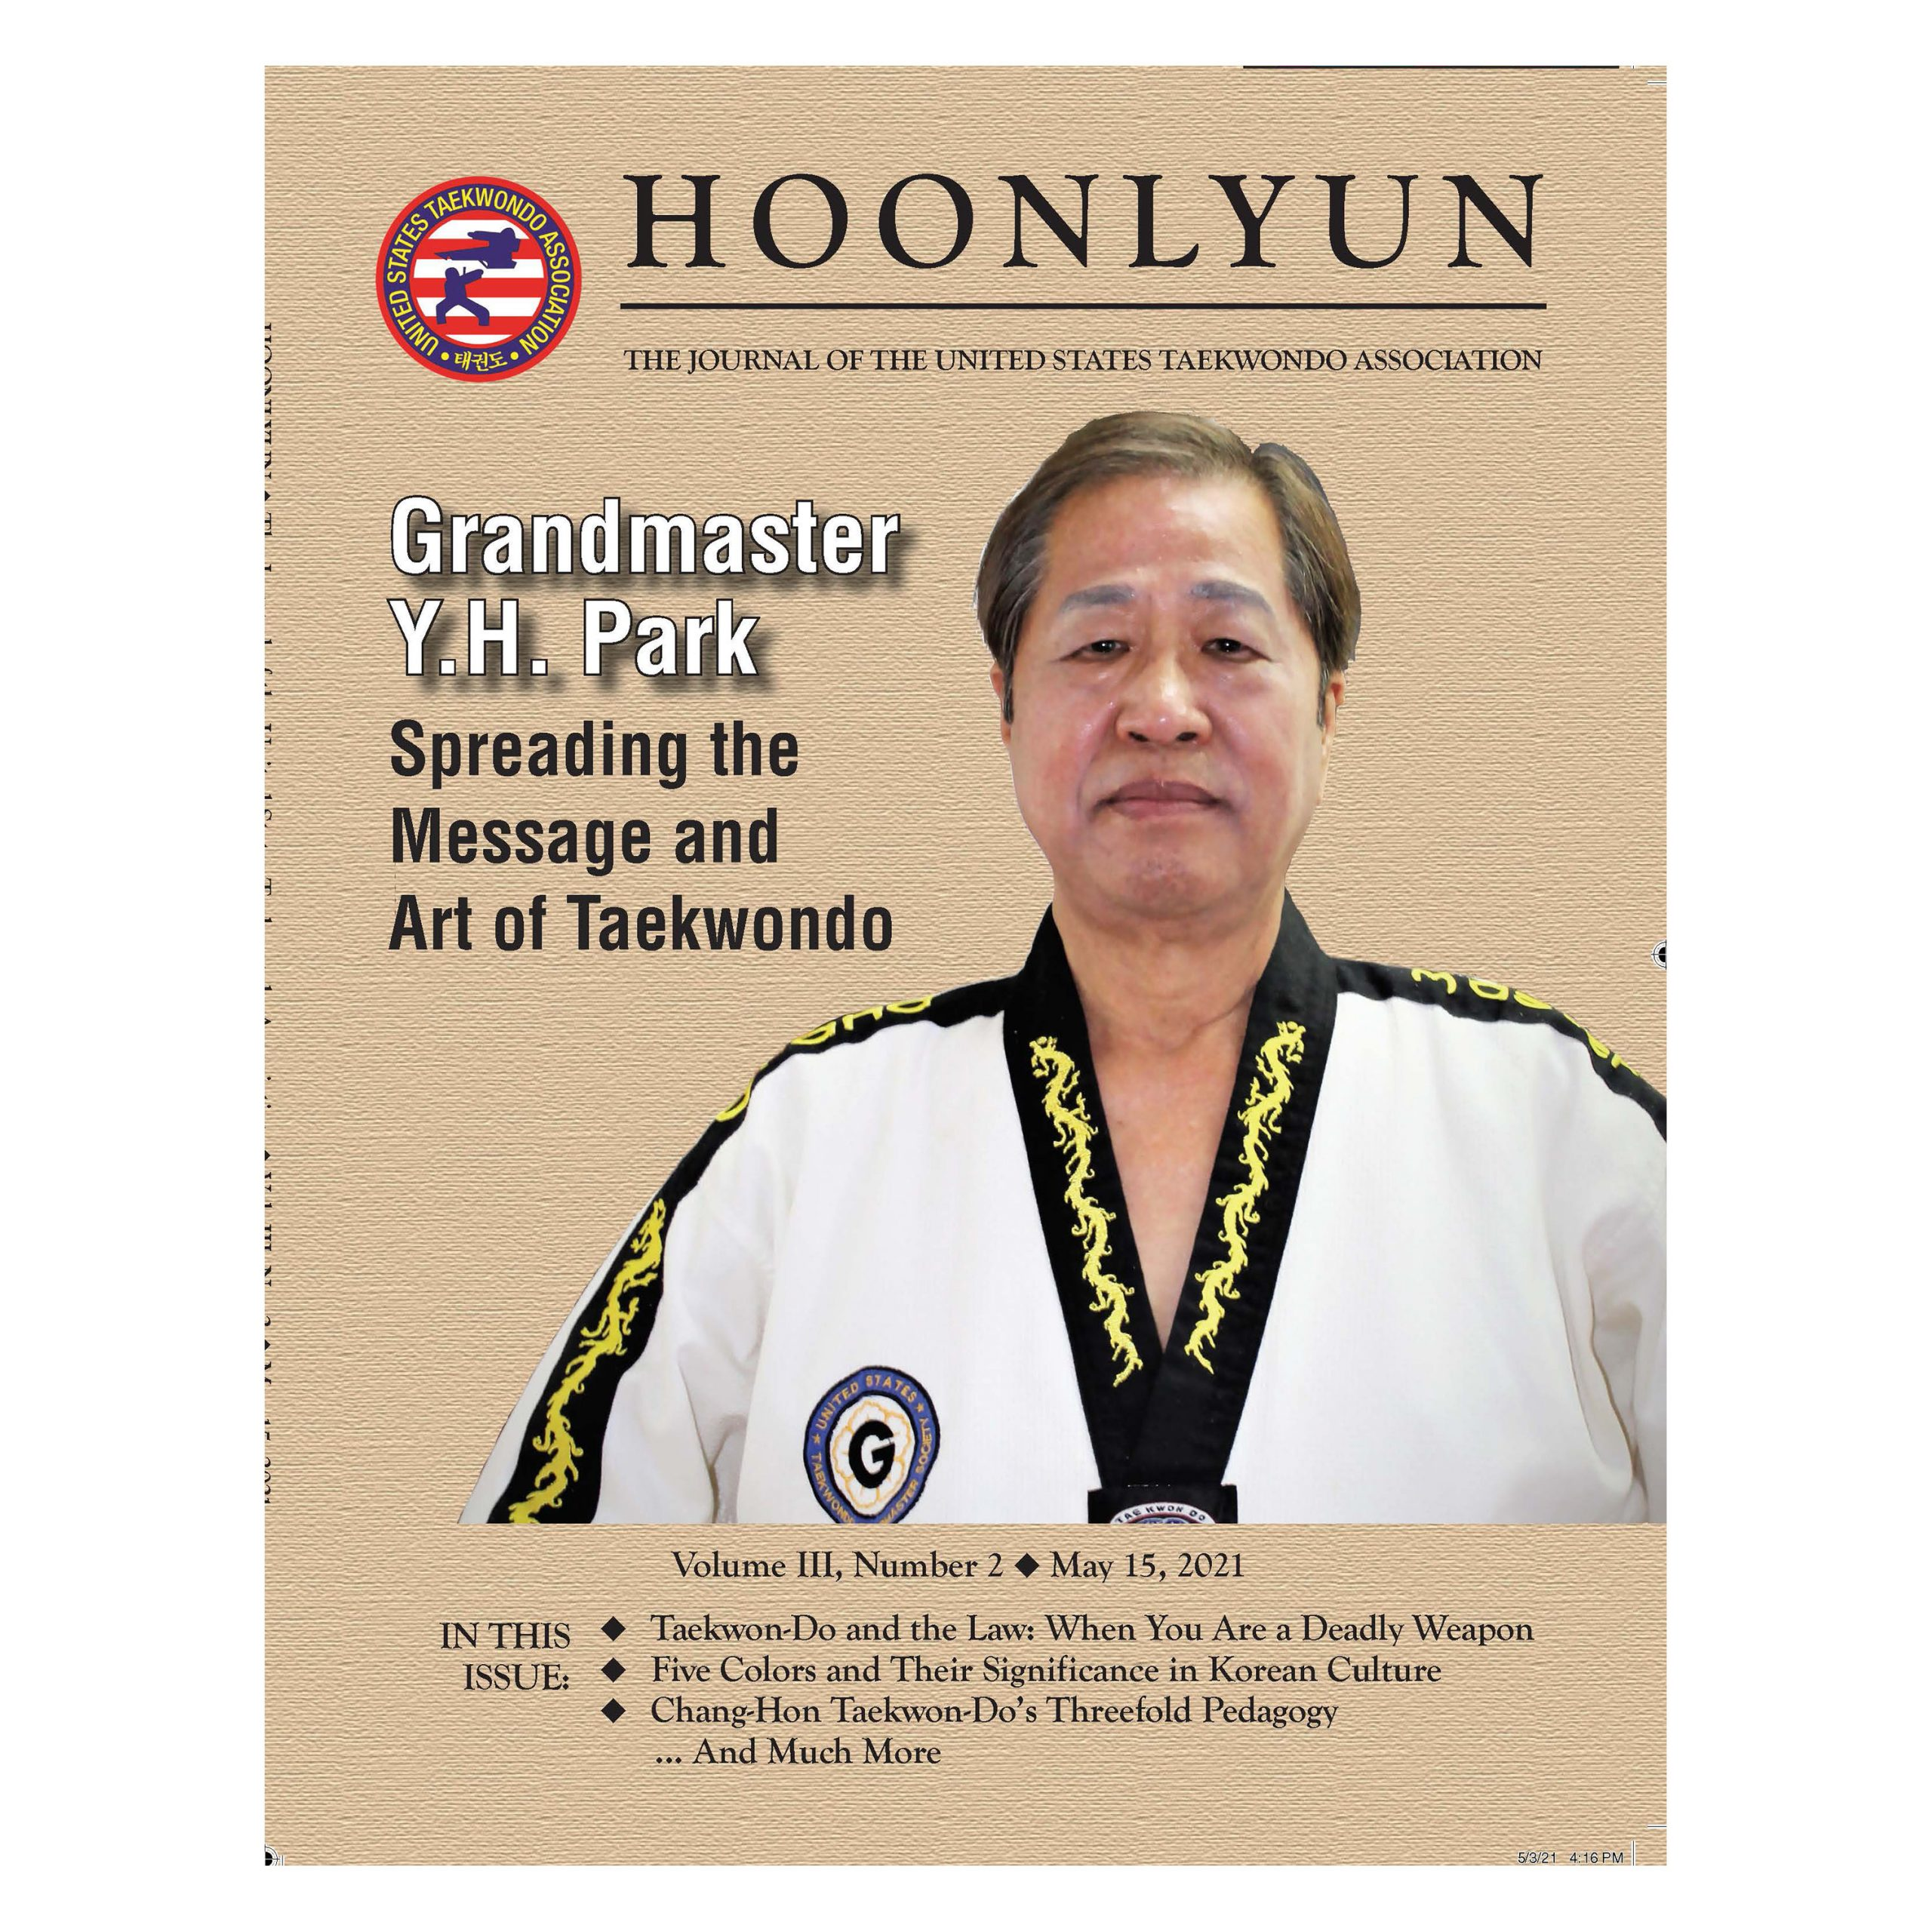 hoonlyun 6 cover